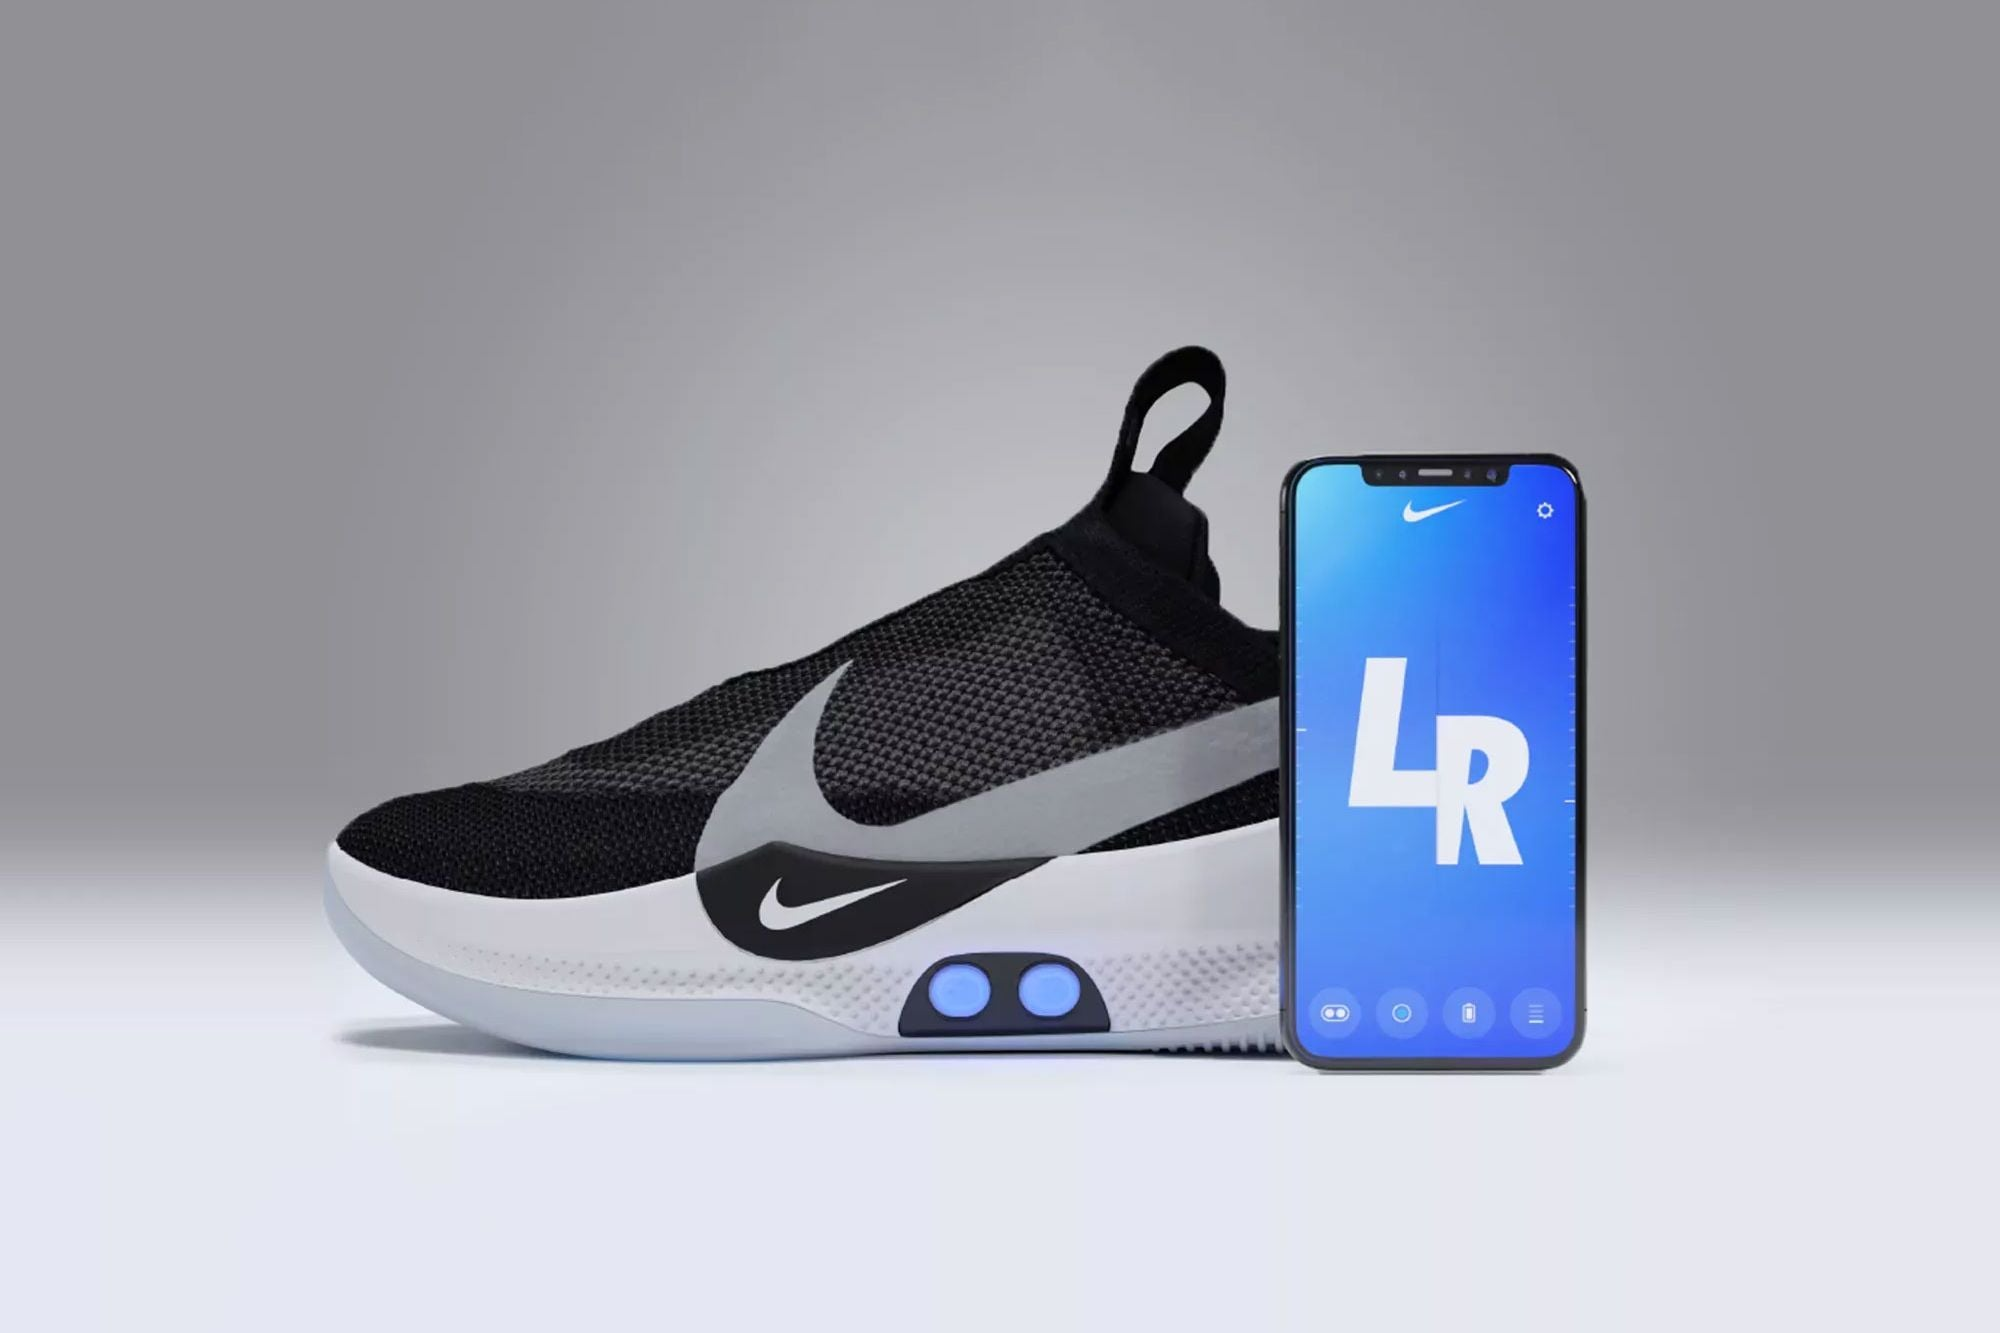 Faulty Update Bricks Nike 'Self-Lacing